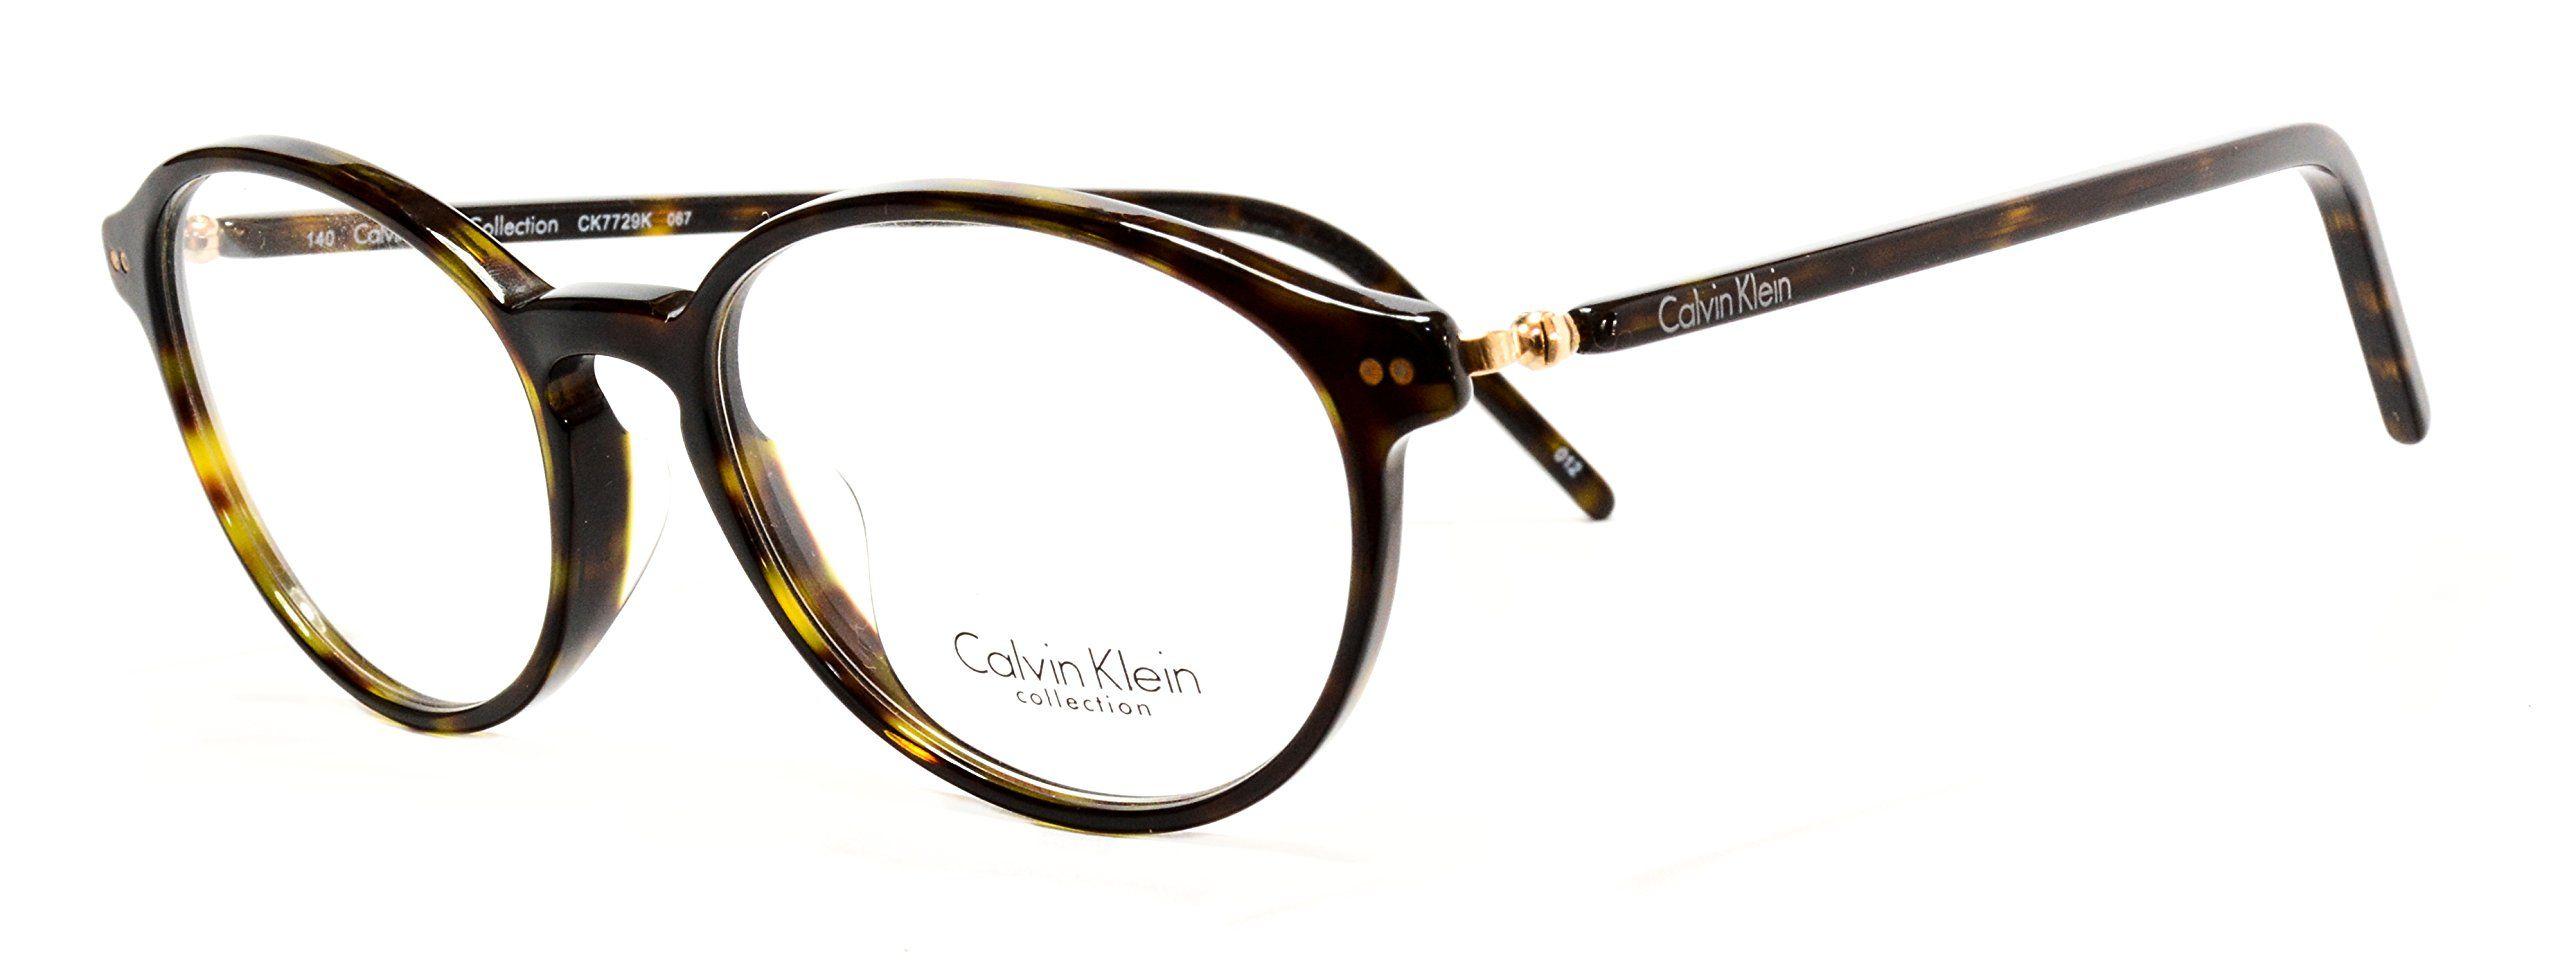 Frame glasses calvin klein - Calvin Klein Eyeglasses Frames Ck7729k 067 Size 51 18 140 A